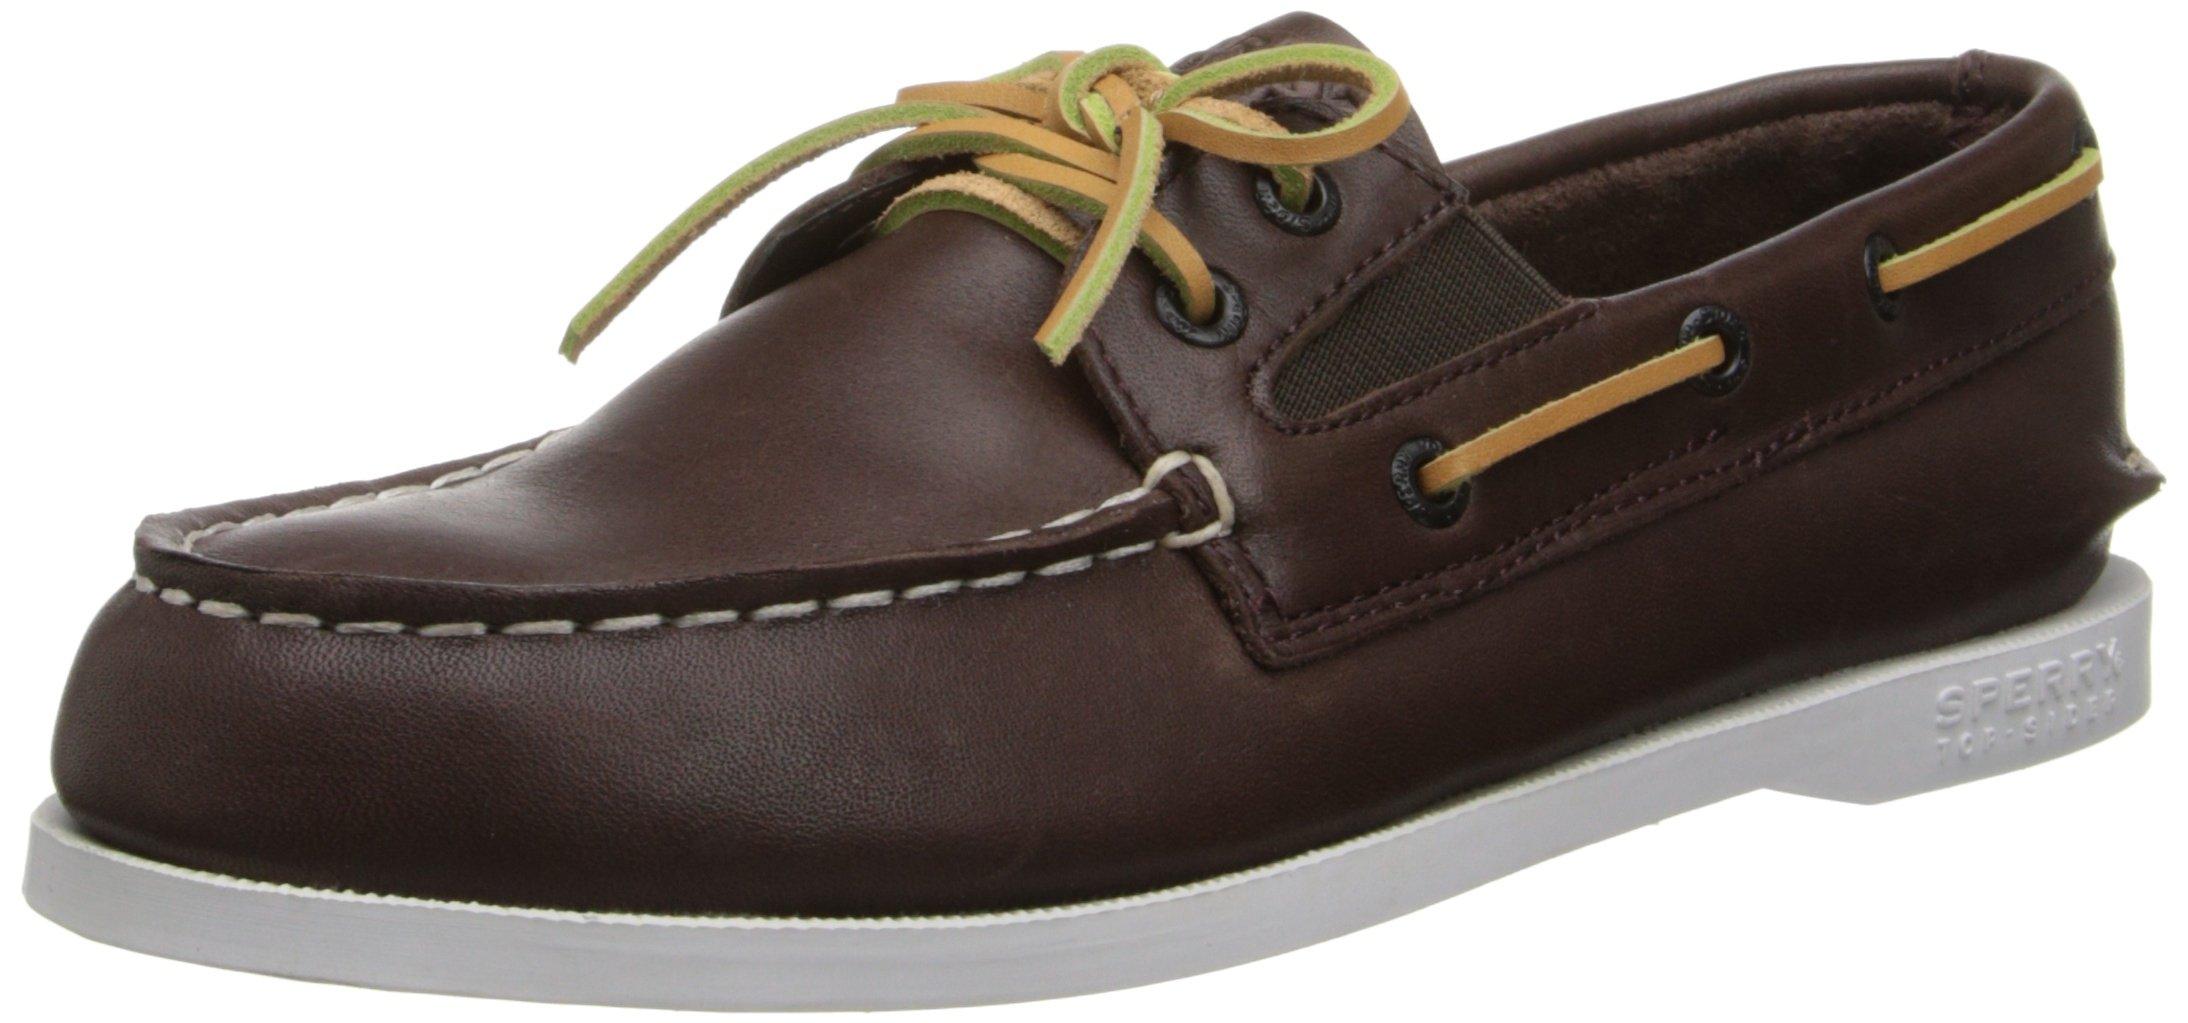 Sperry Authentic Original Slip On Boat Shoe (Toddler/Little Kid/Big Kid),Brown,2.5 M US Little Kid